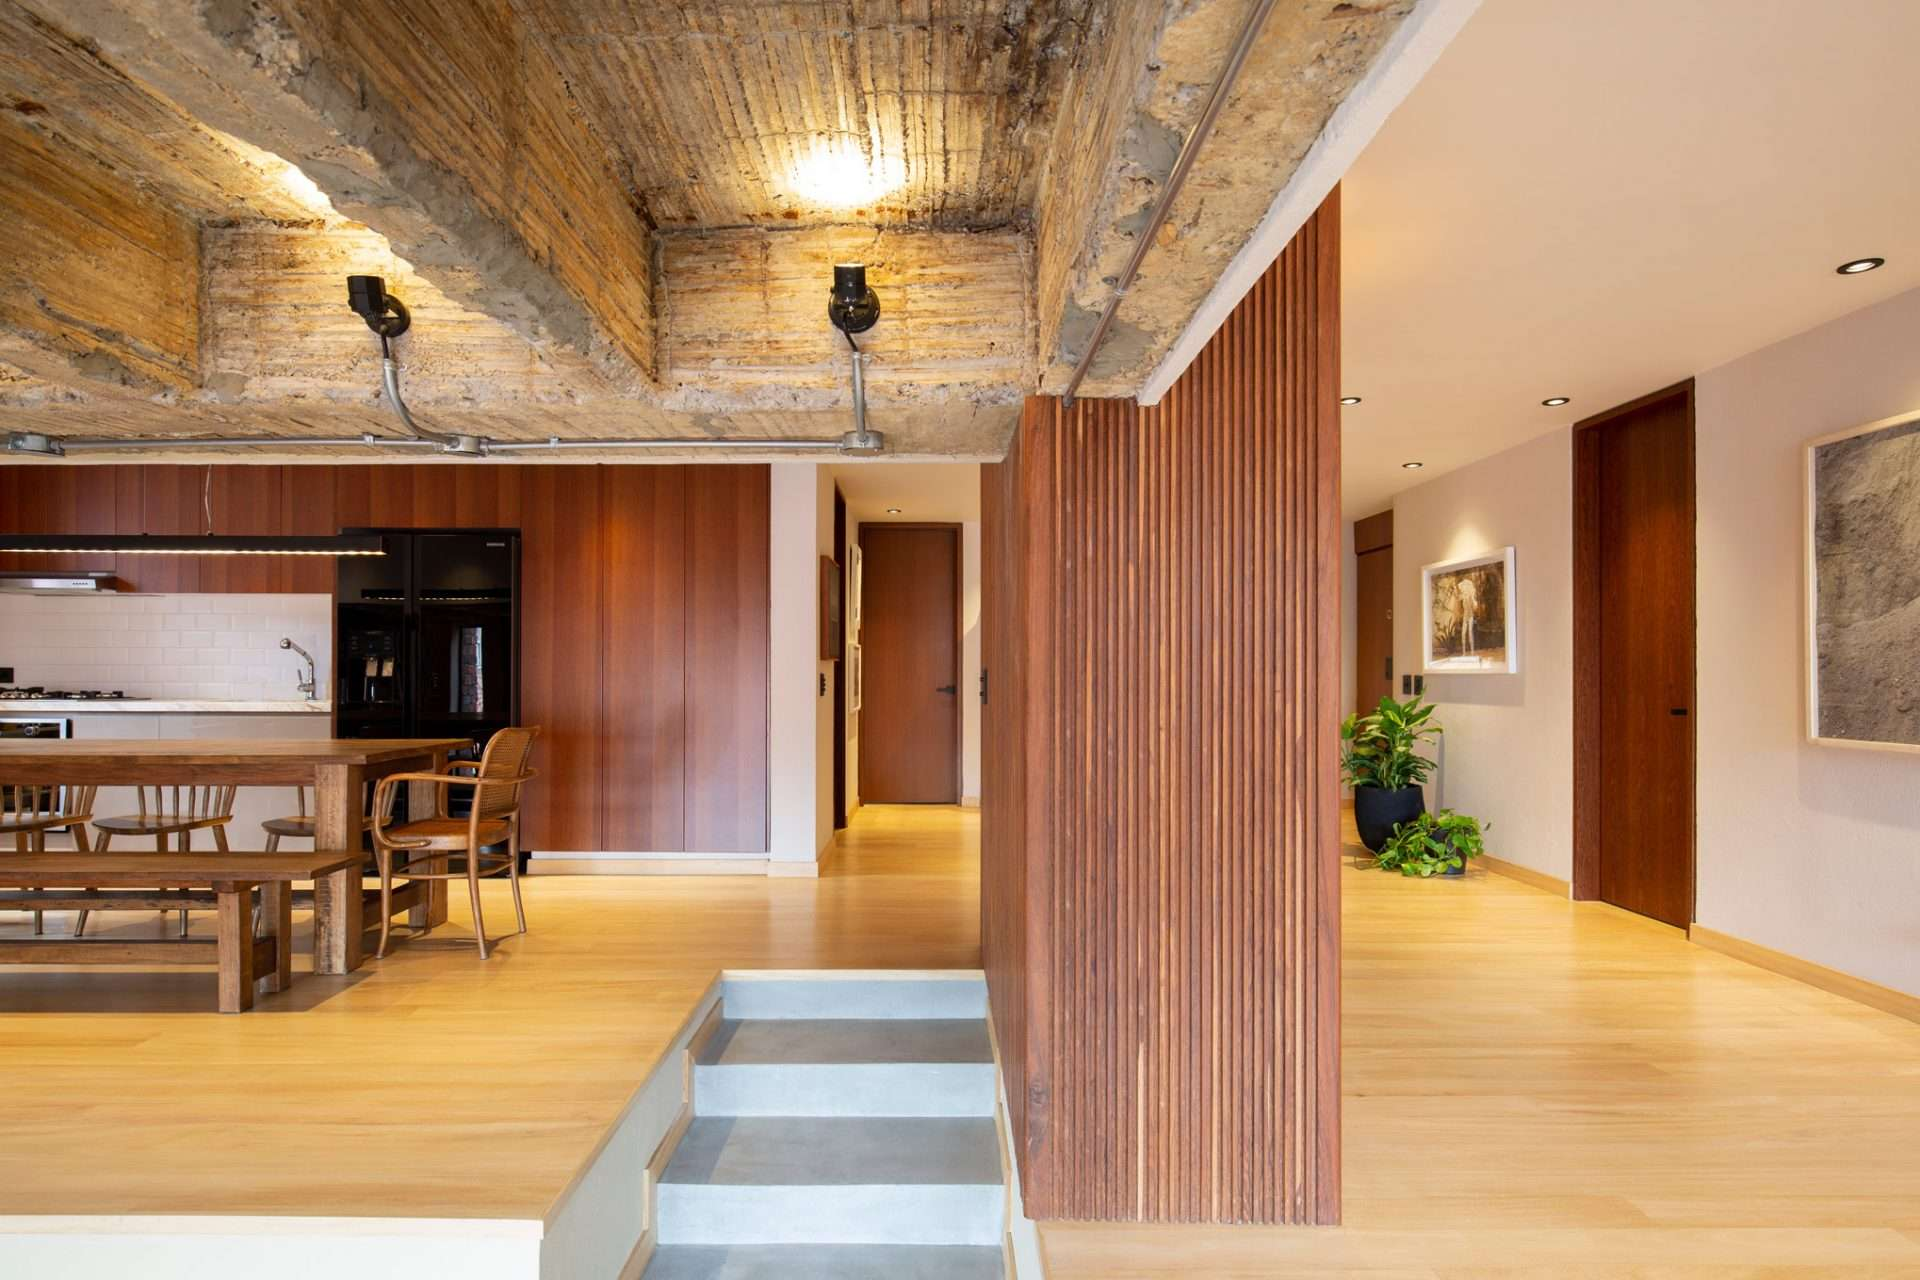 07.MLS_arquitectura_taller_tragaluz_interior_dutch_bogota_colombia_simon_bosch_photography